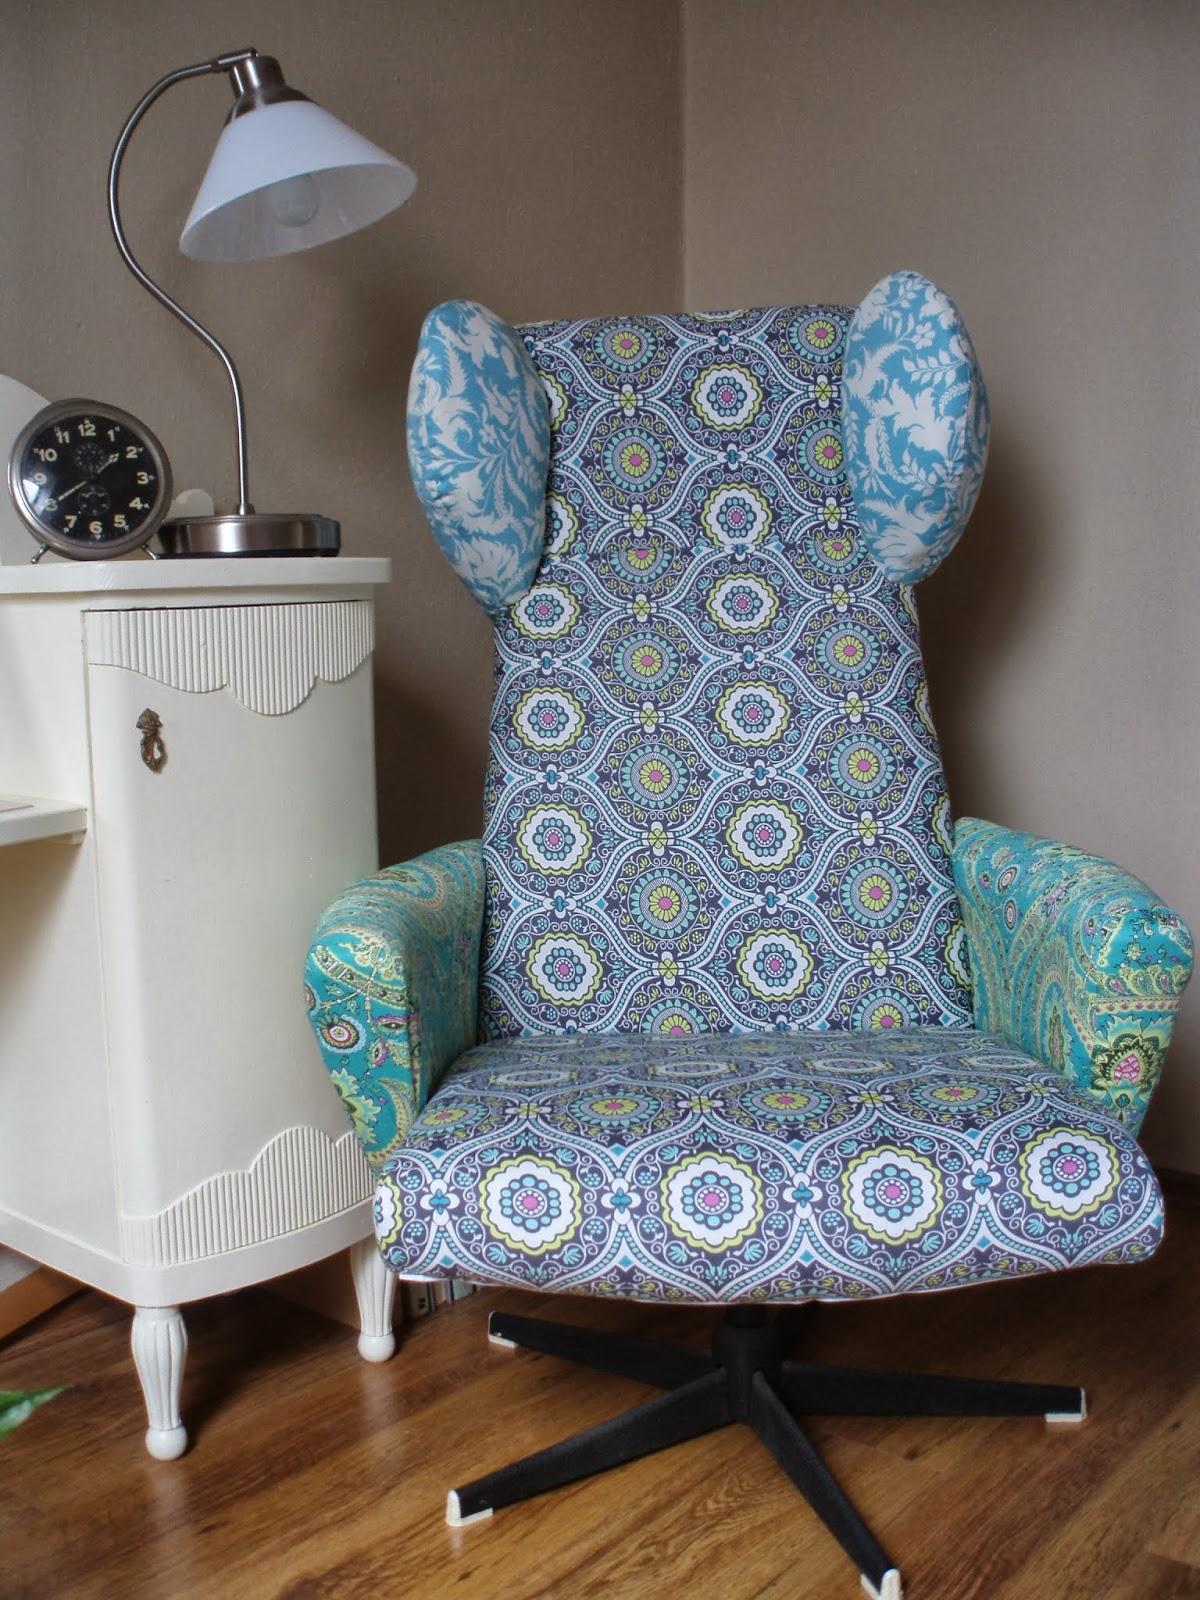 Majdalena staronov u k - Telas para tapizar sofas precios ...